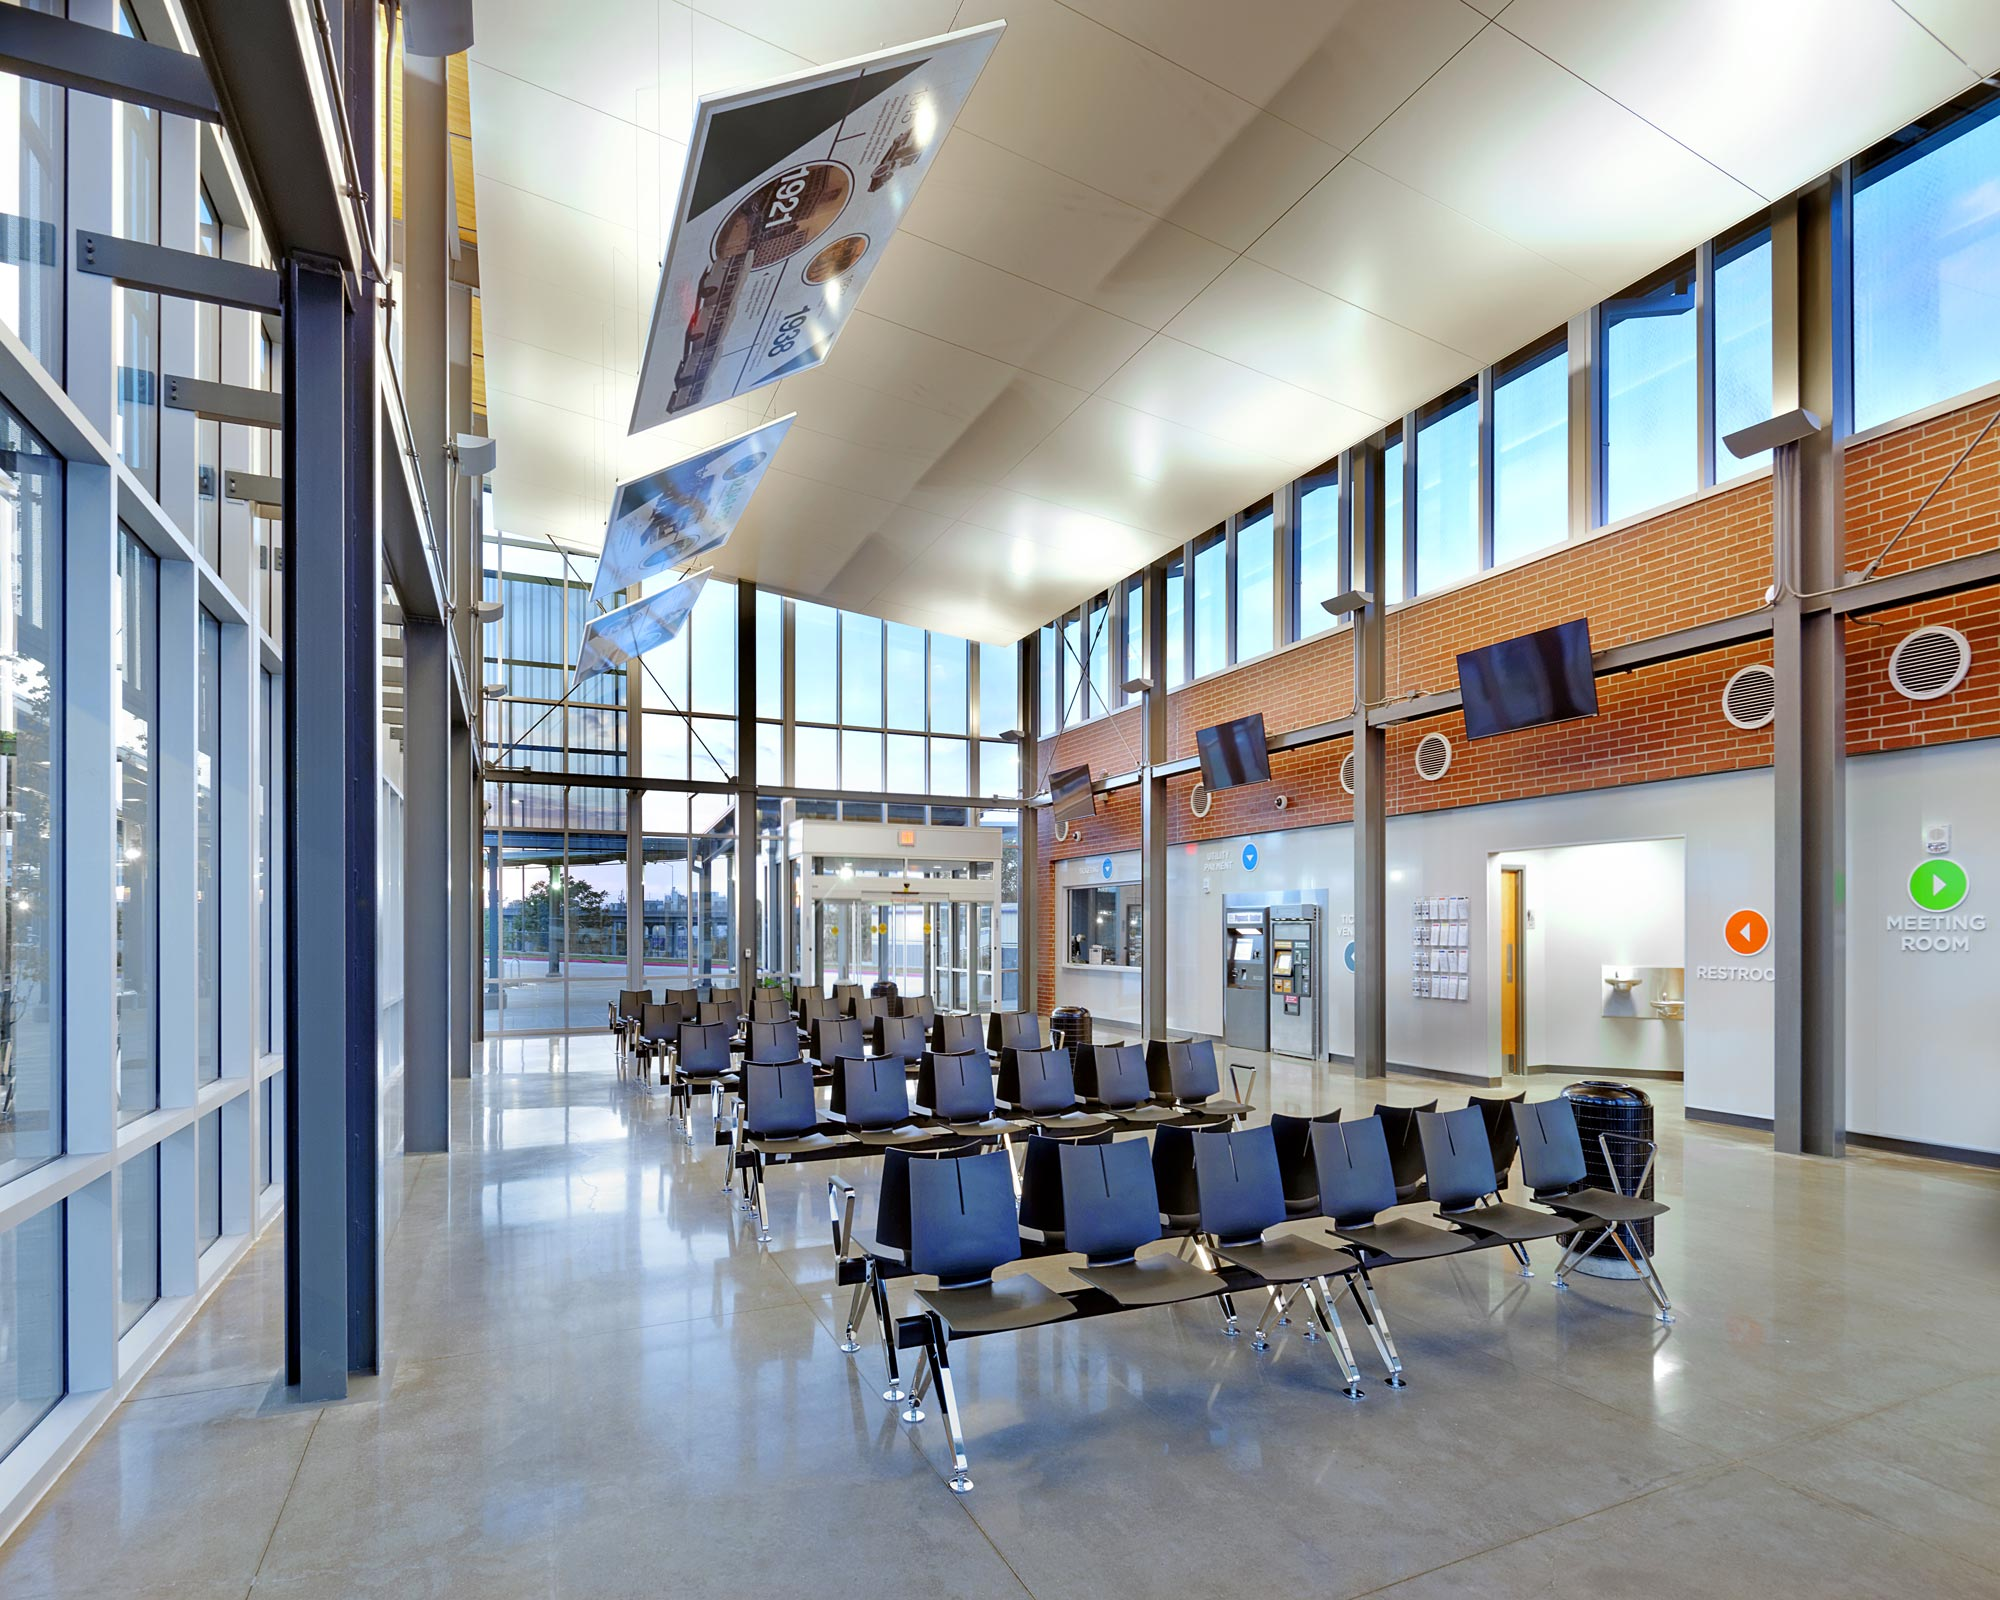 City-Union-Bus-Terminal-H-Design-Interior-01.jpg